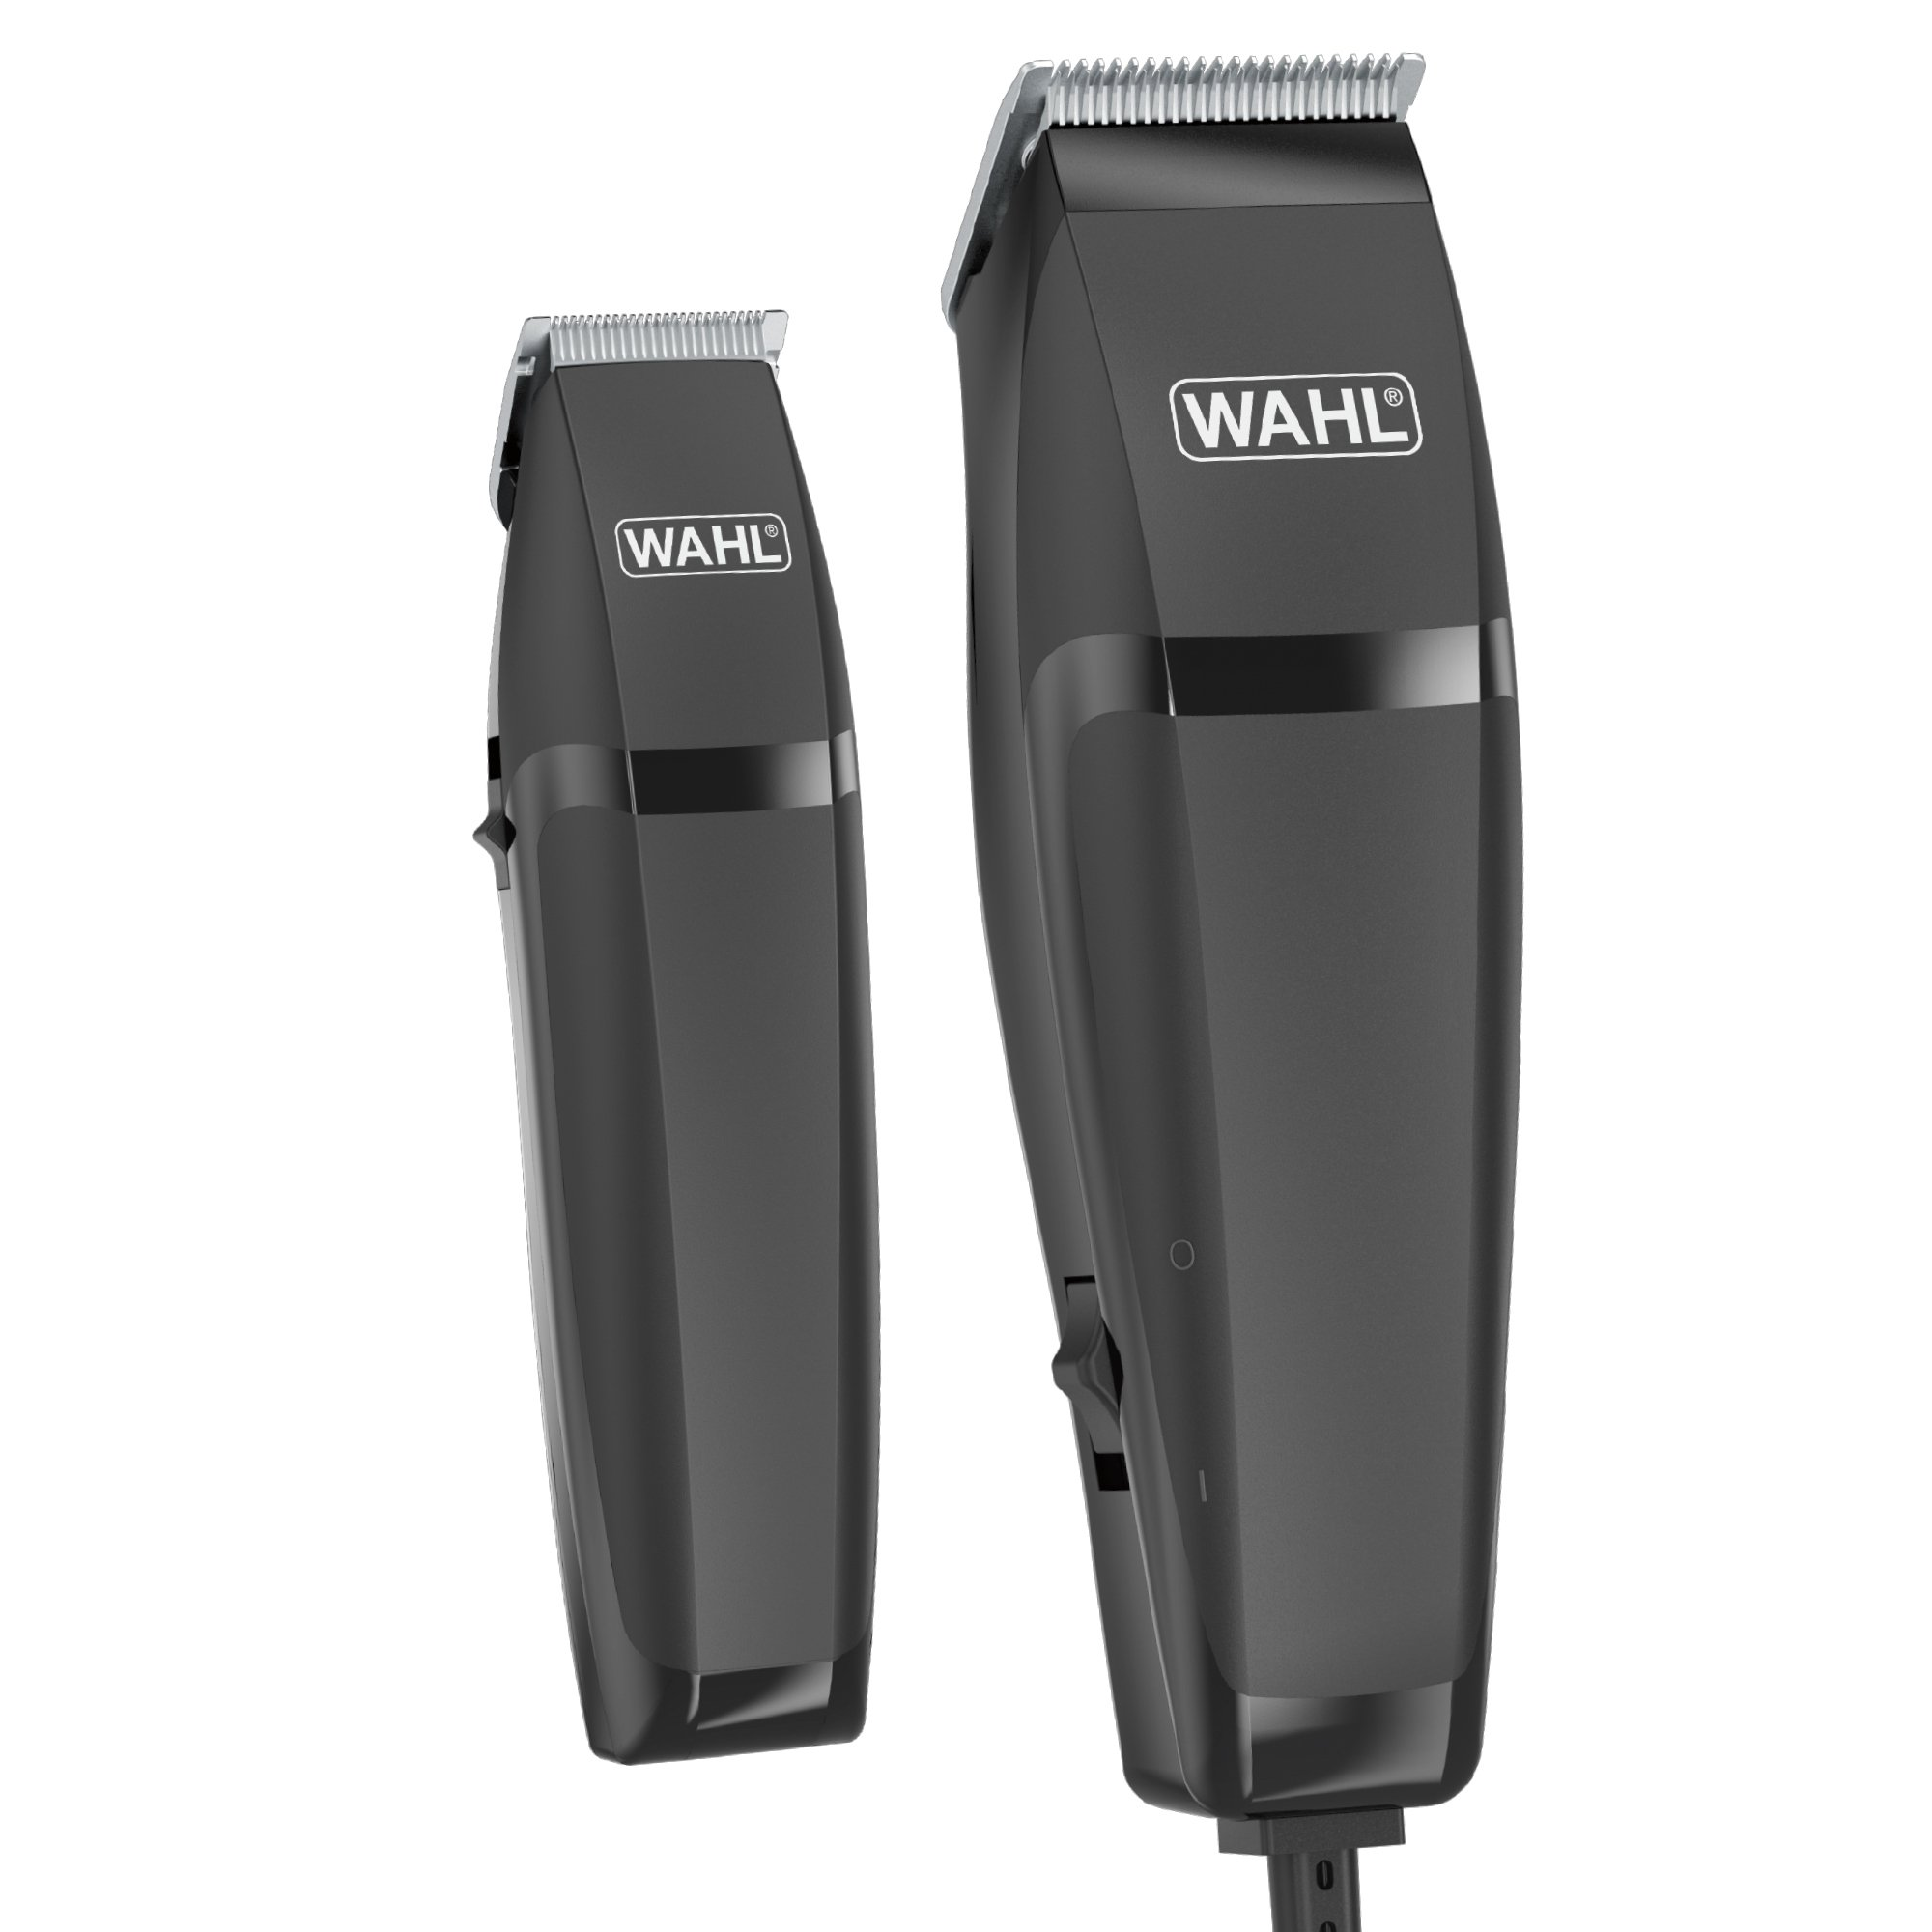 Wahl Combo Pro Styling Kit #79450